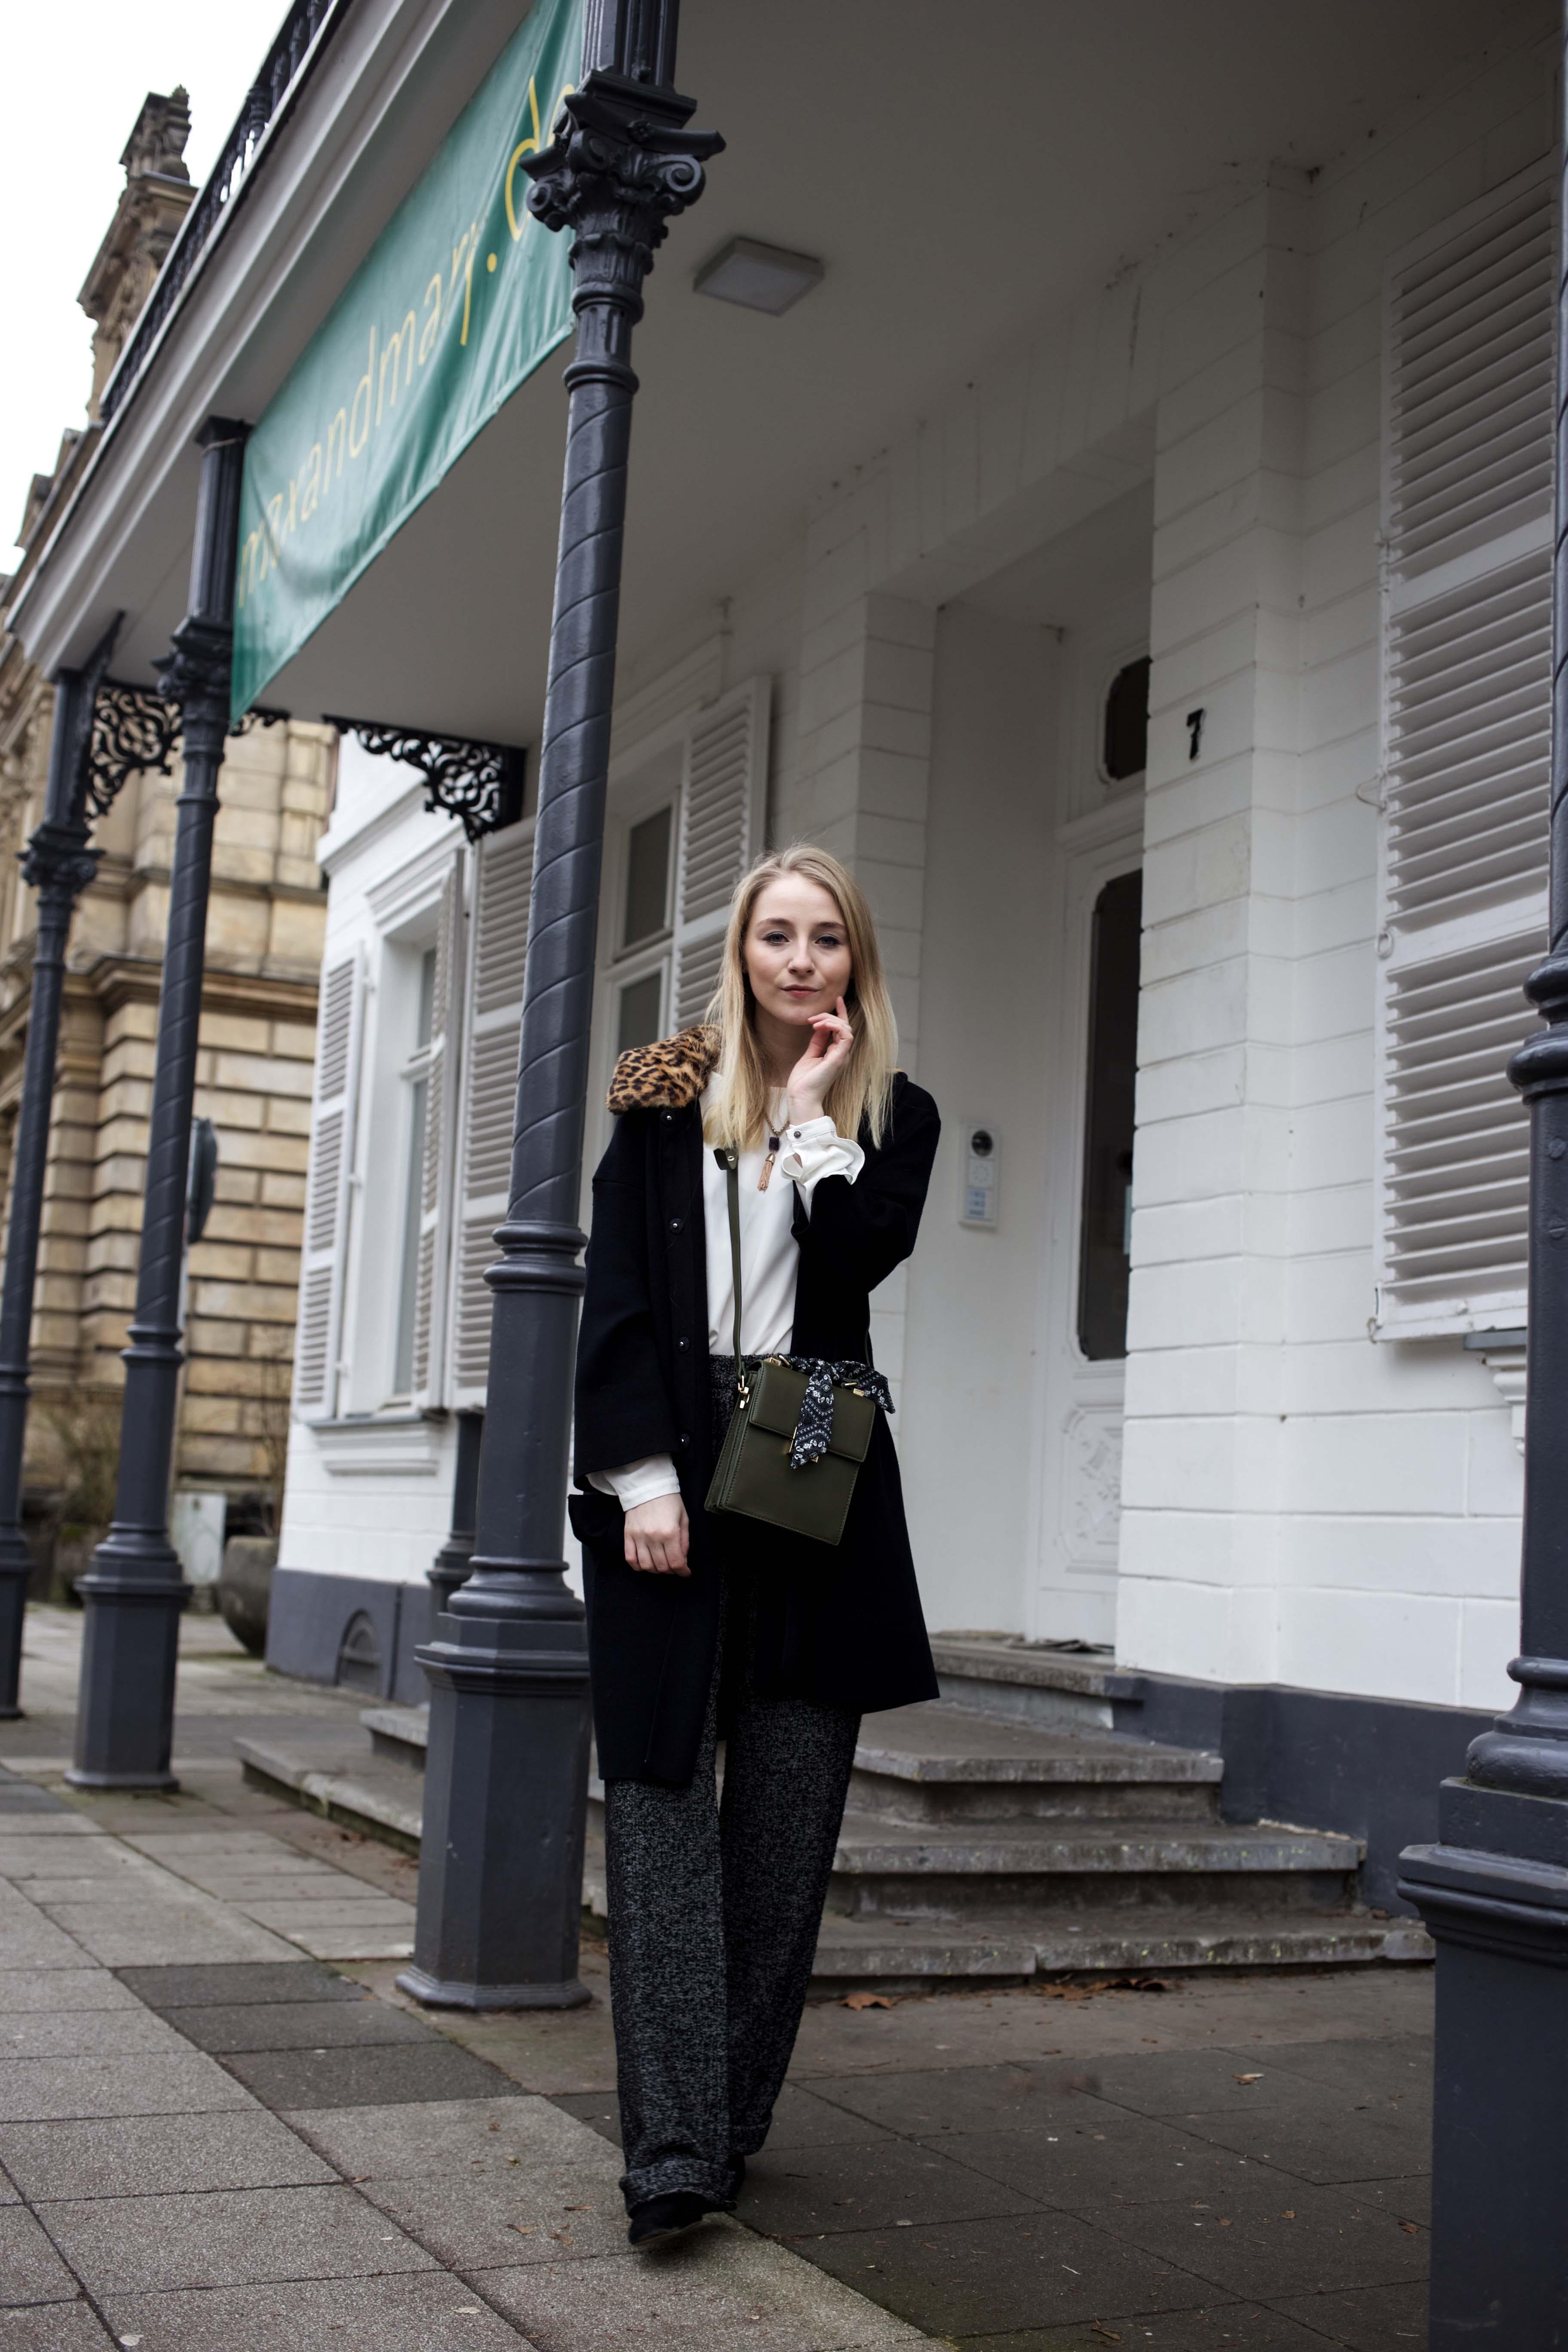 marlenehose-kombinieren-streetstyle-look-modeblog-fashion-blog-cologne-berlin-bonn_9948